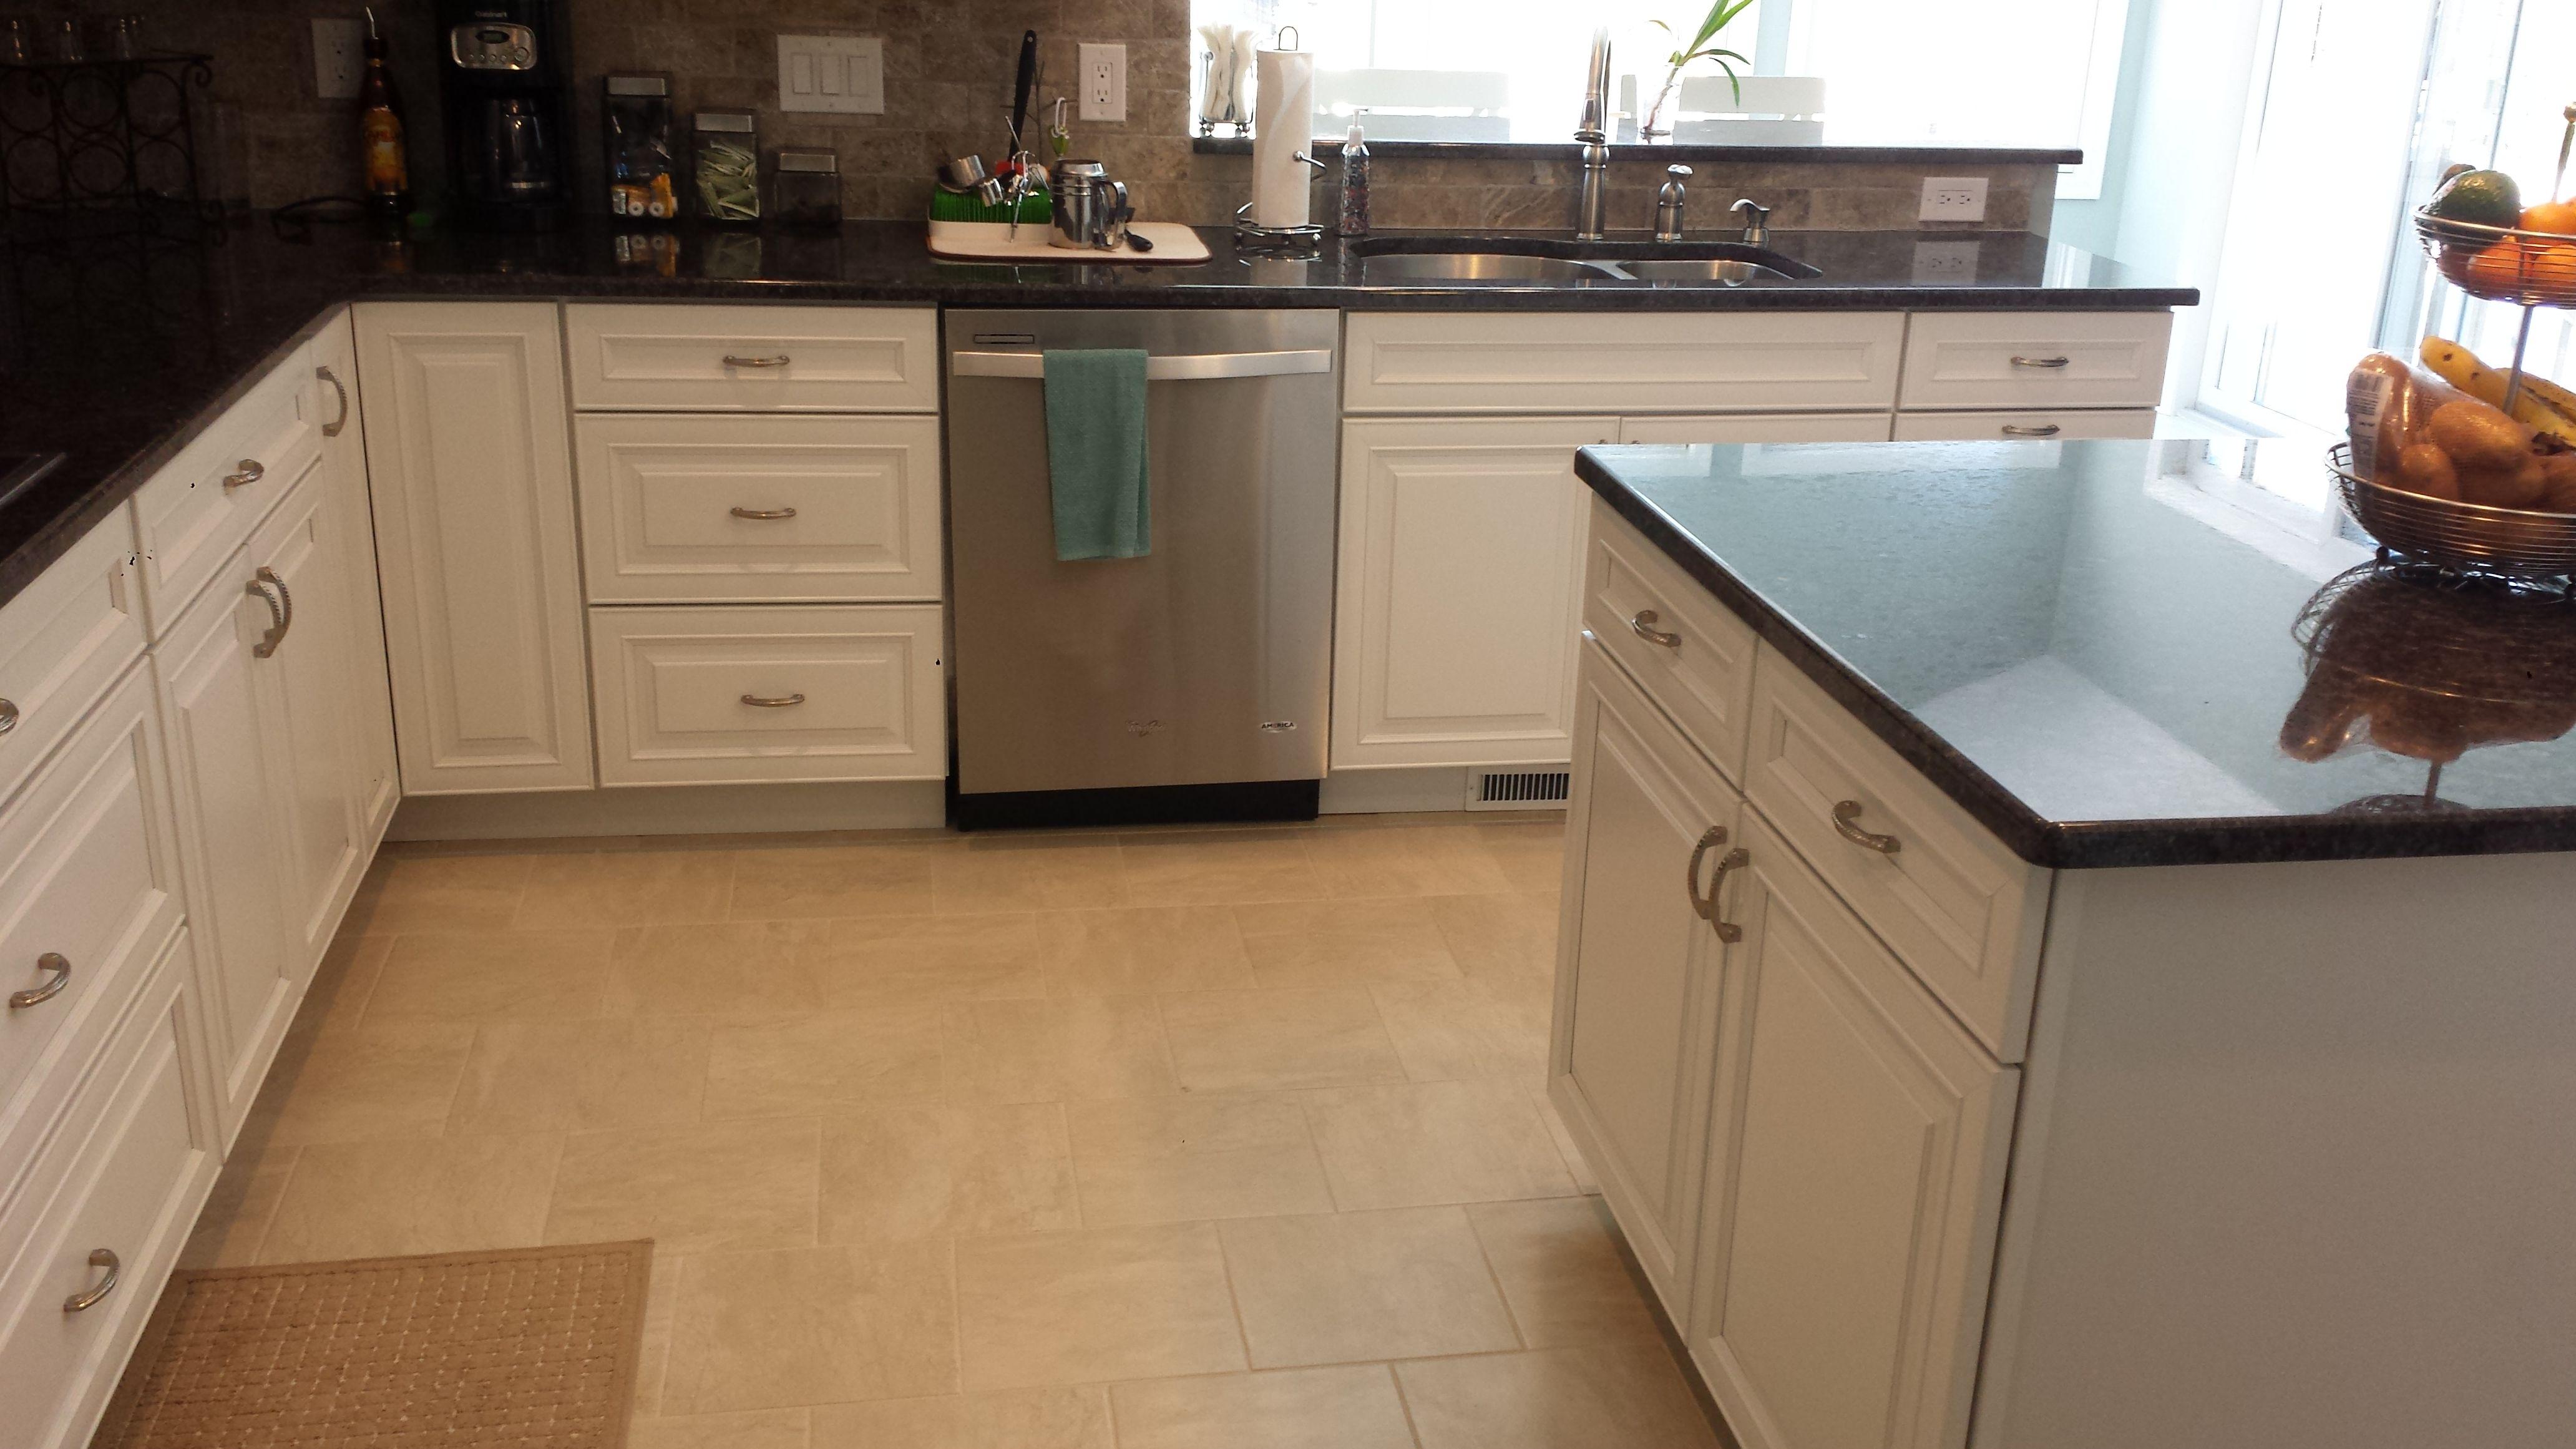 Streater Kitchen Designed By Thomas Matteo #kitchen #kraftmaid #cabinets  #dishwasher #granite #island | Tomu0027s Board | Pinterest | Kraftmaid  Cabinets, ...